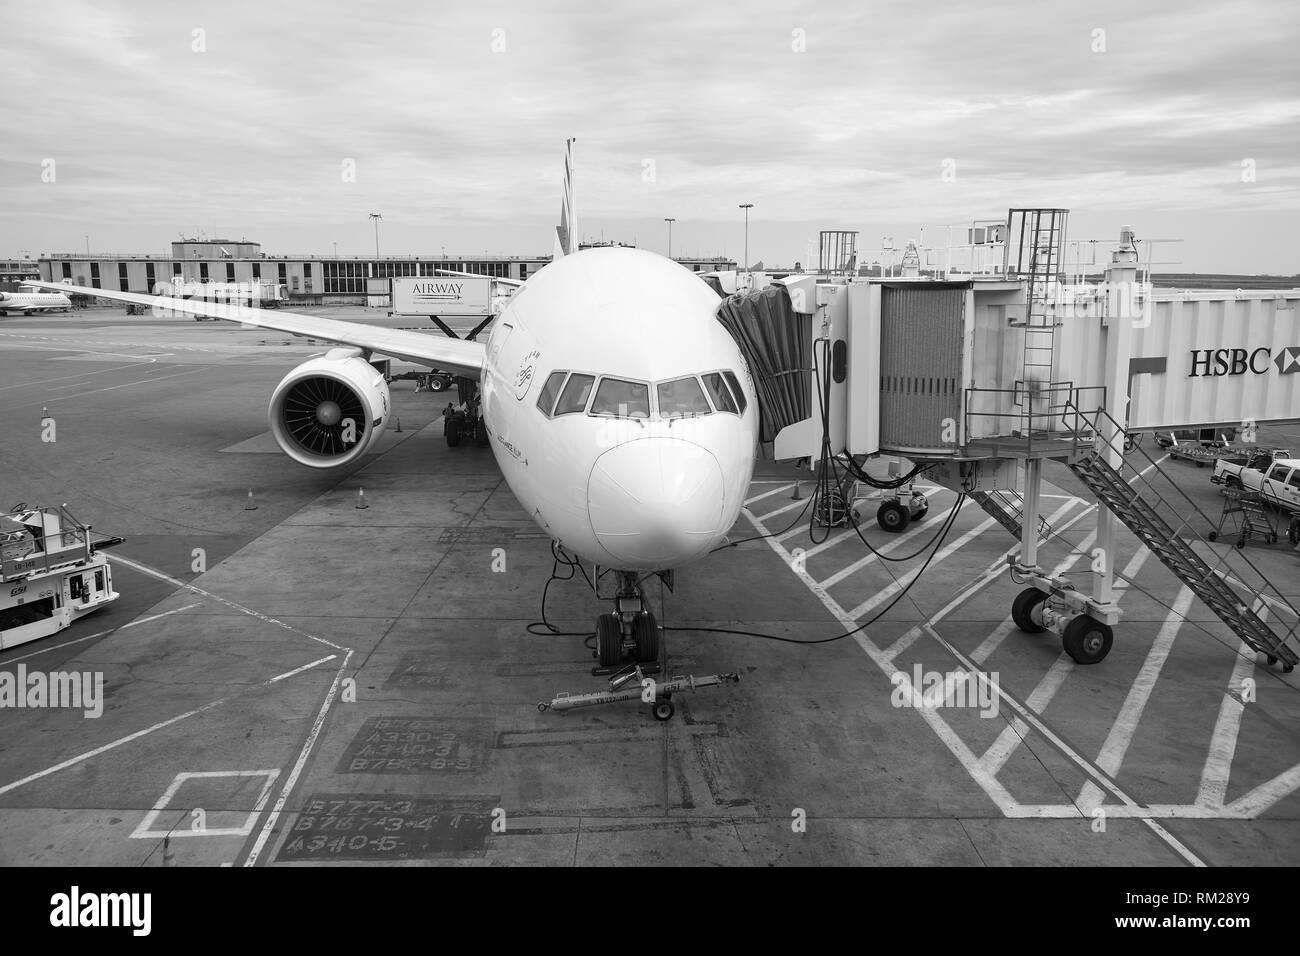 NEW YORK - APRIL 06, 2016: passenger jet airplane docked at JFK Airport. John F. Kennedy International Airport is a major international airport locate - Stock Image